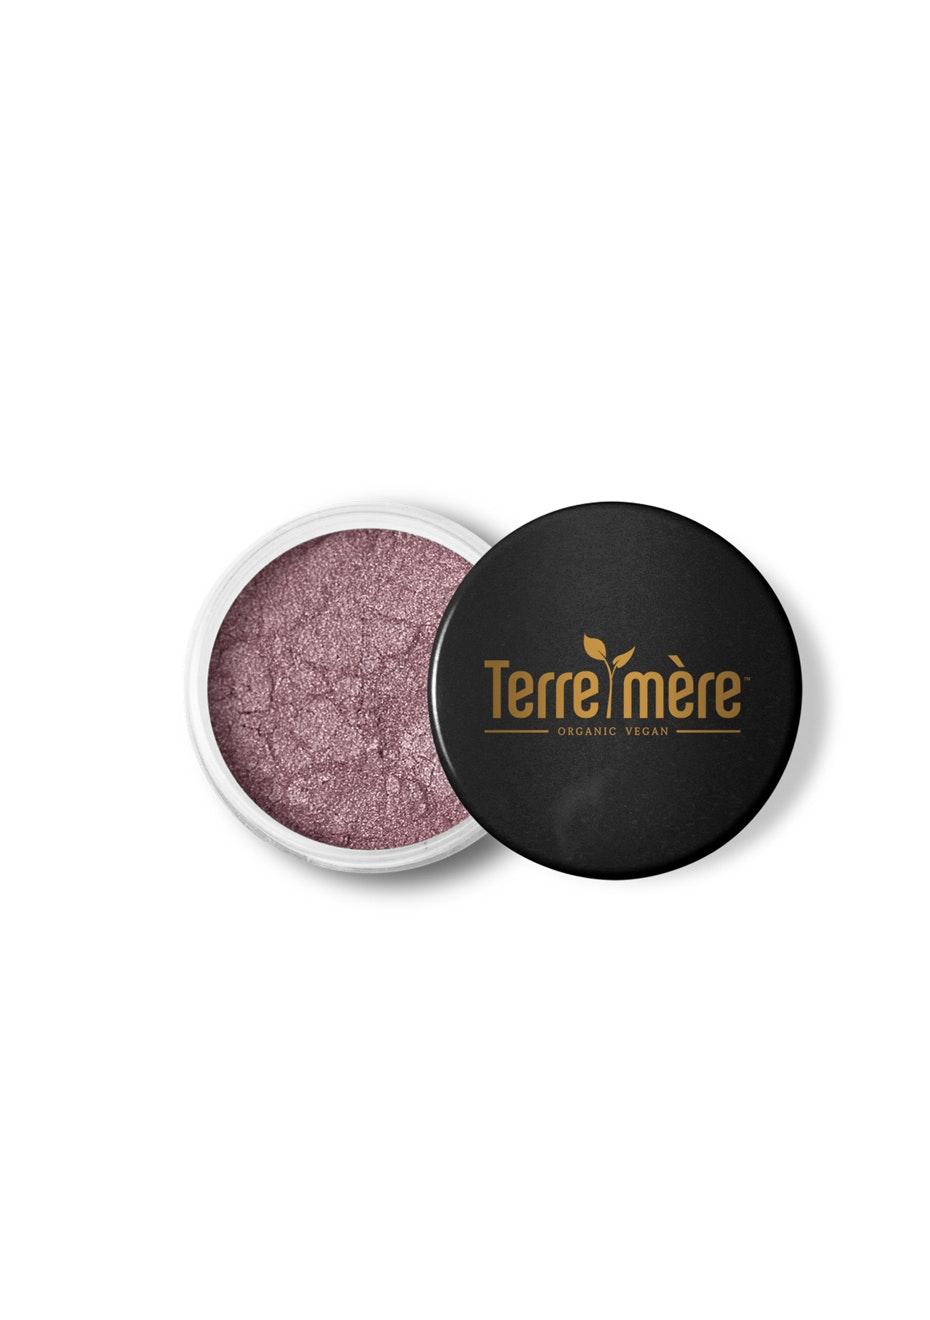 Terre Mere - Mineral Eyeshadow - Bronzed Amethyst